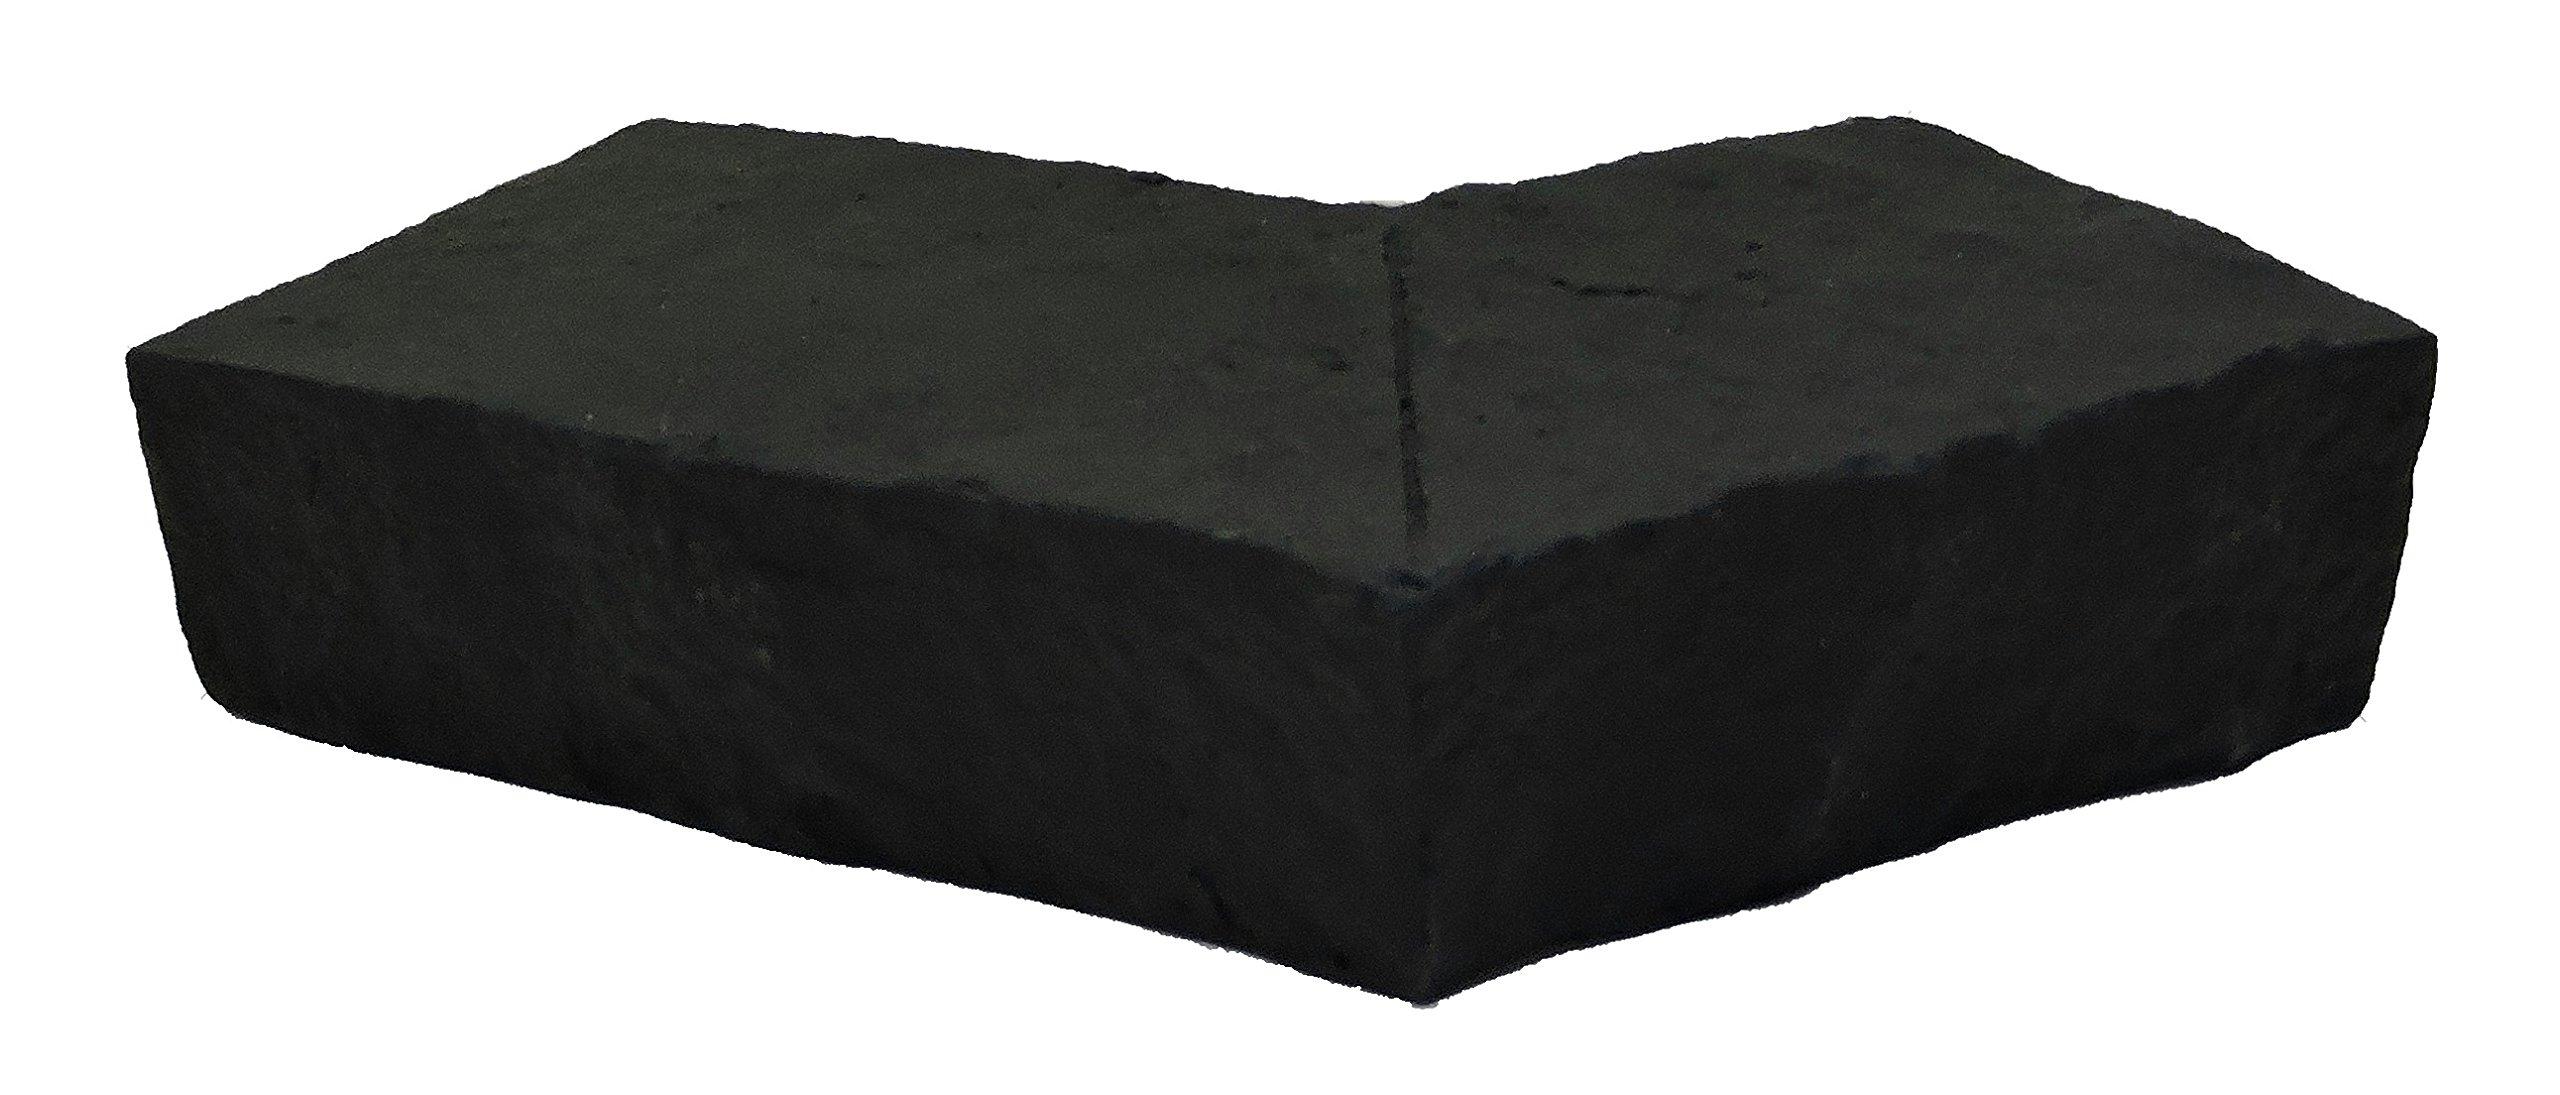 NextStone Sandstone Ledger Outside Corner Onyx